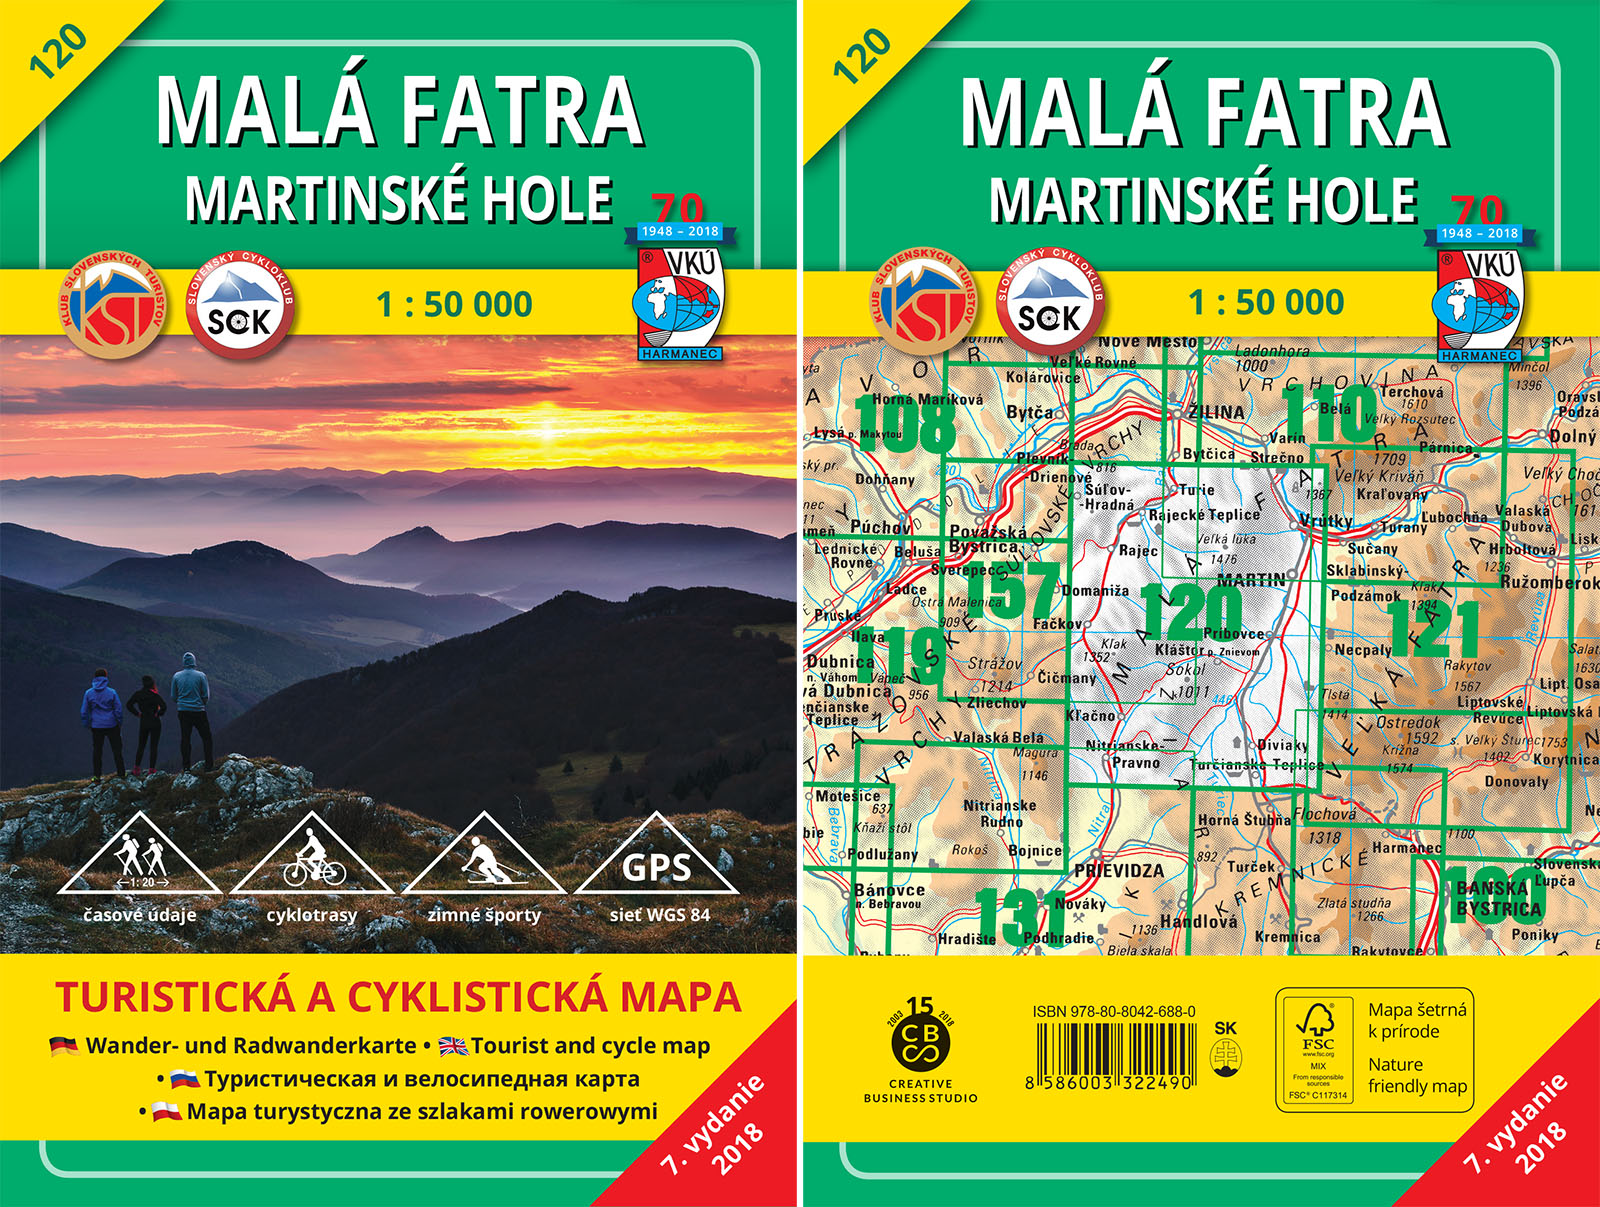 TM 120 - Malá Fatra - Martinské Hole